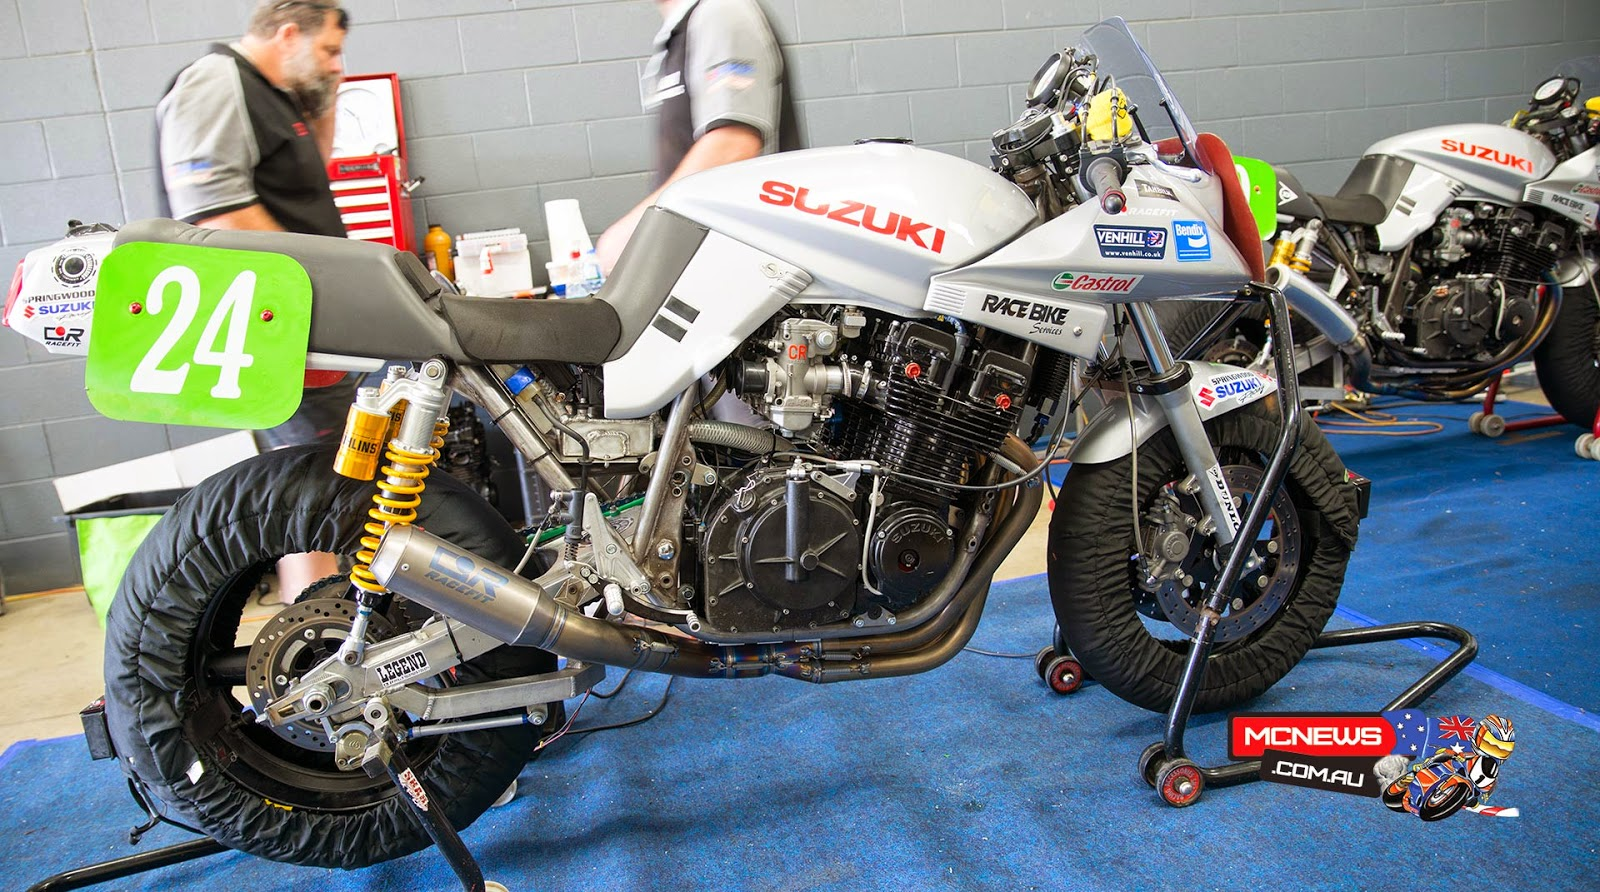 KATANA Suzuki  - Page 4 BRS-Weblog%2C%2Bclassics%2C%2Bracing%2Bbikes%2C%2Boldskool%2Bsuperbikes%2C%2Bcustom%2Bmotorcycles%2Band%2Bcaferacers!%2B(62)